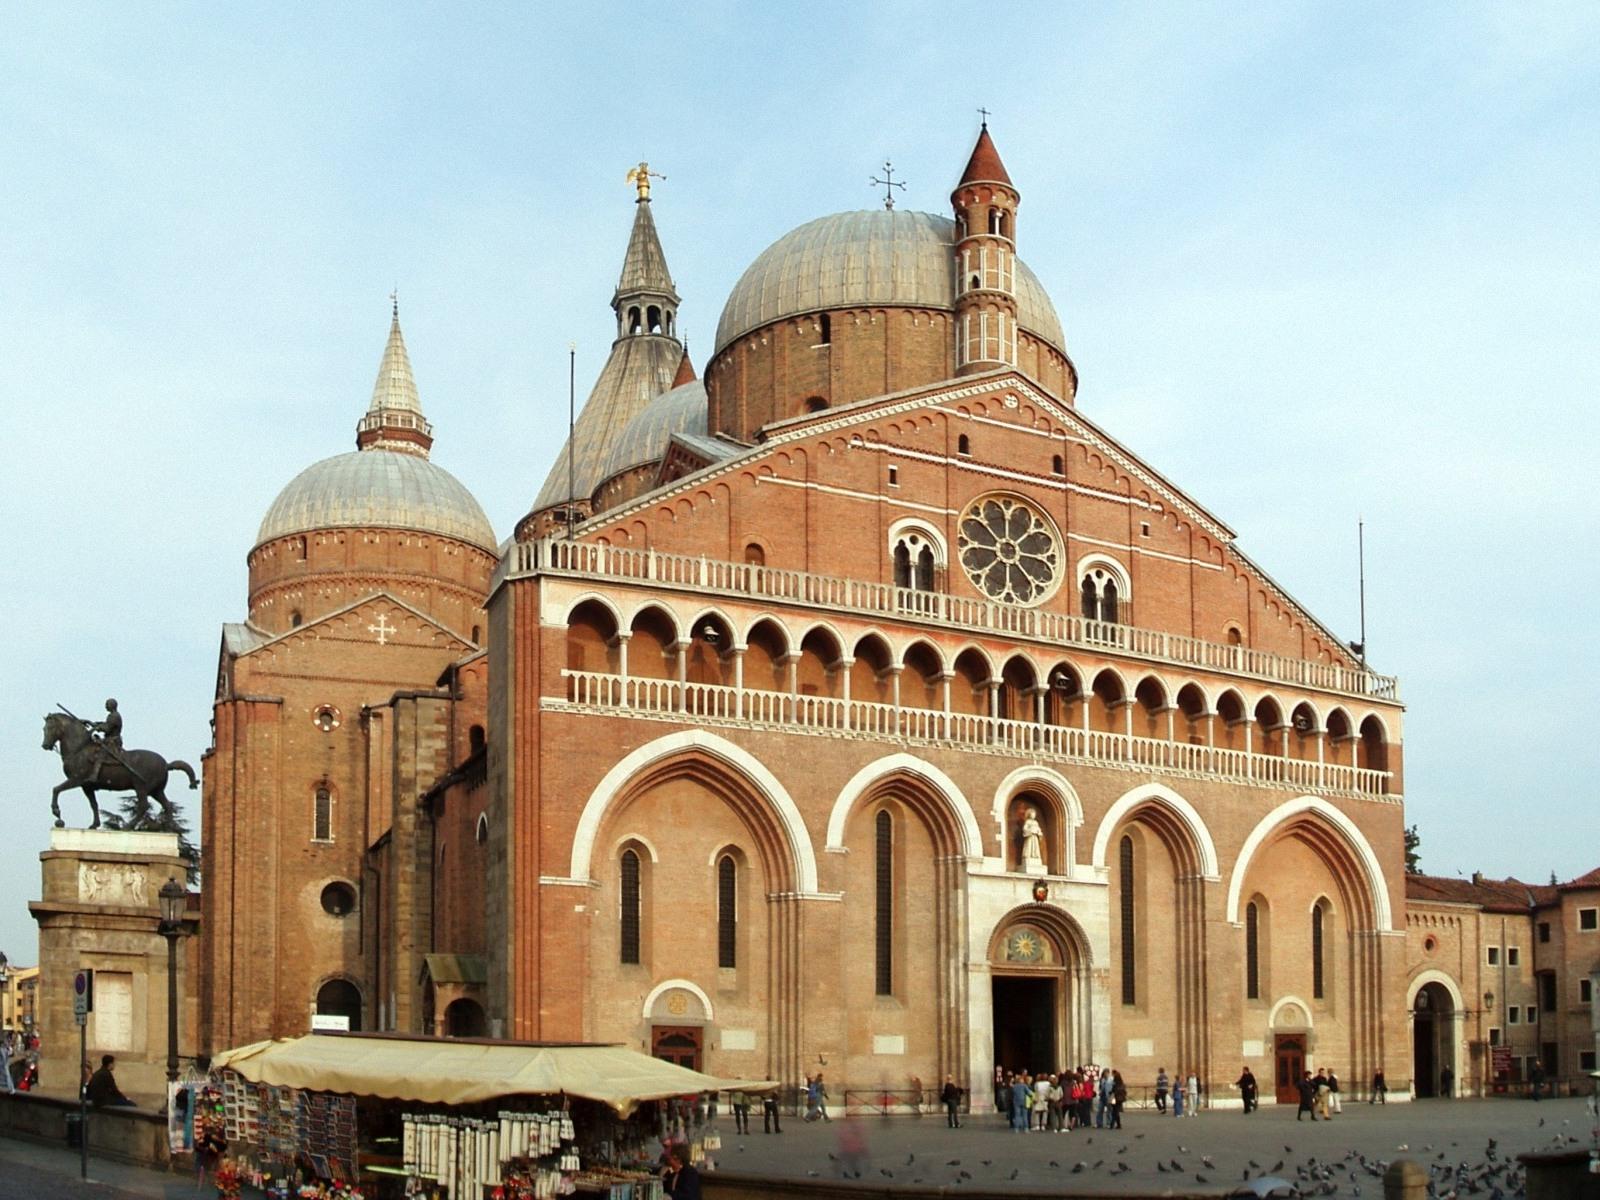 Catedrala Sfântul Anton